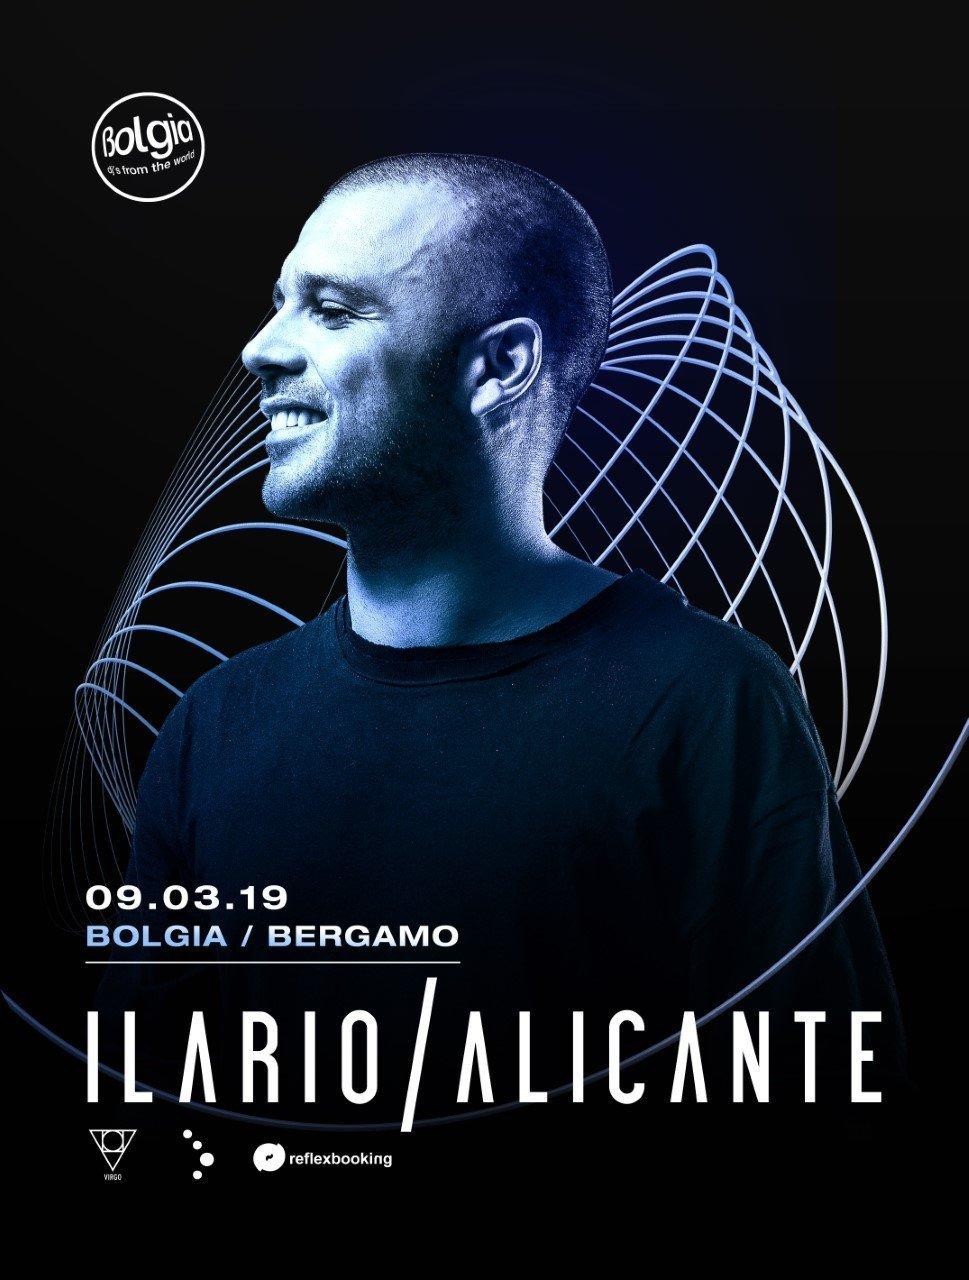 Bolgia Ilario Alicante Front